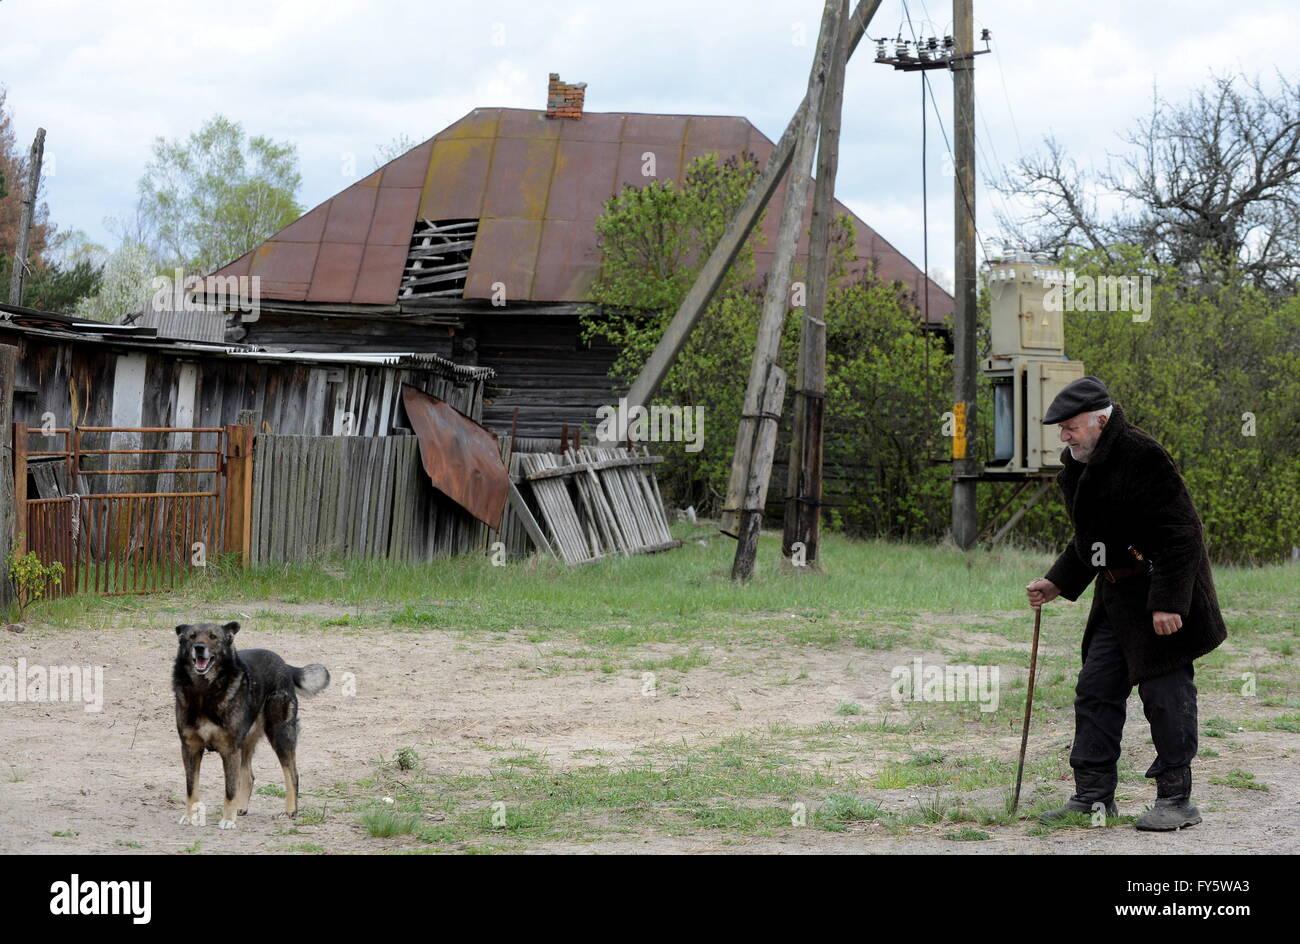 GOMEL REGION, BELARUS. APRIL 22, 2016. 90-year-old Ivan Shamyanok, the last resident of the village of Tulgovichi, - Stock Image